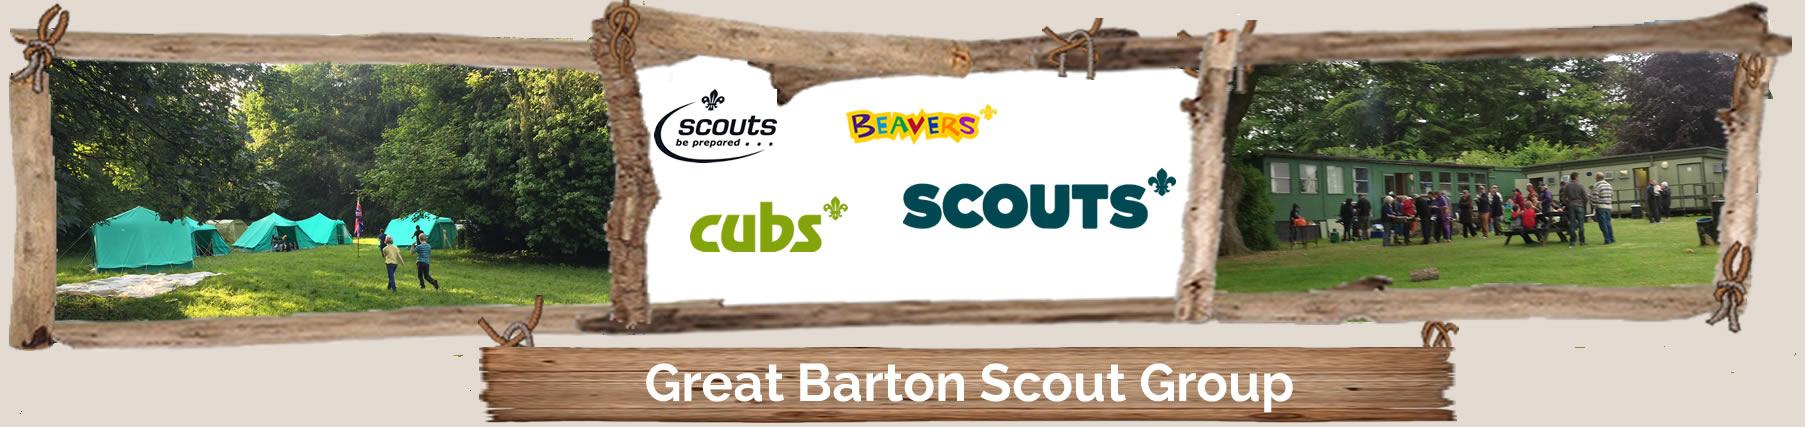 Great Barton Scouts Header